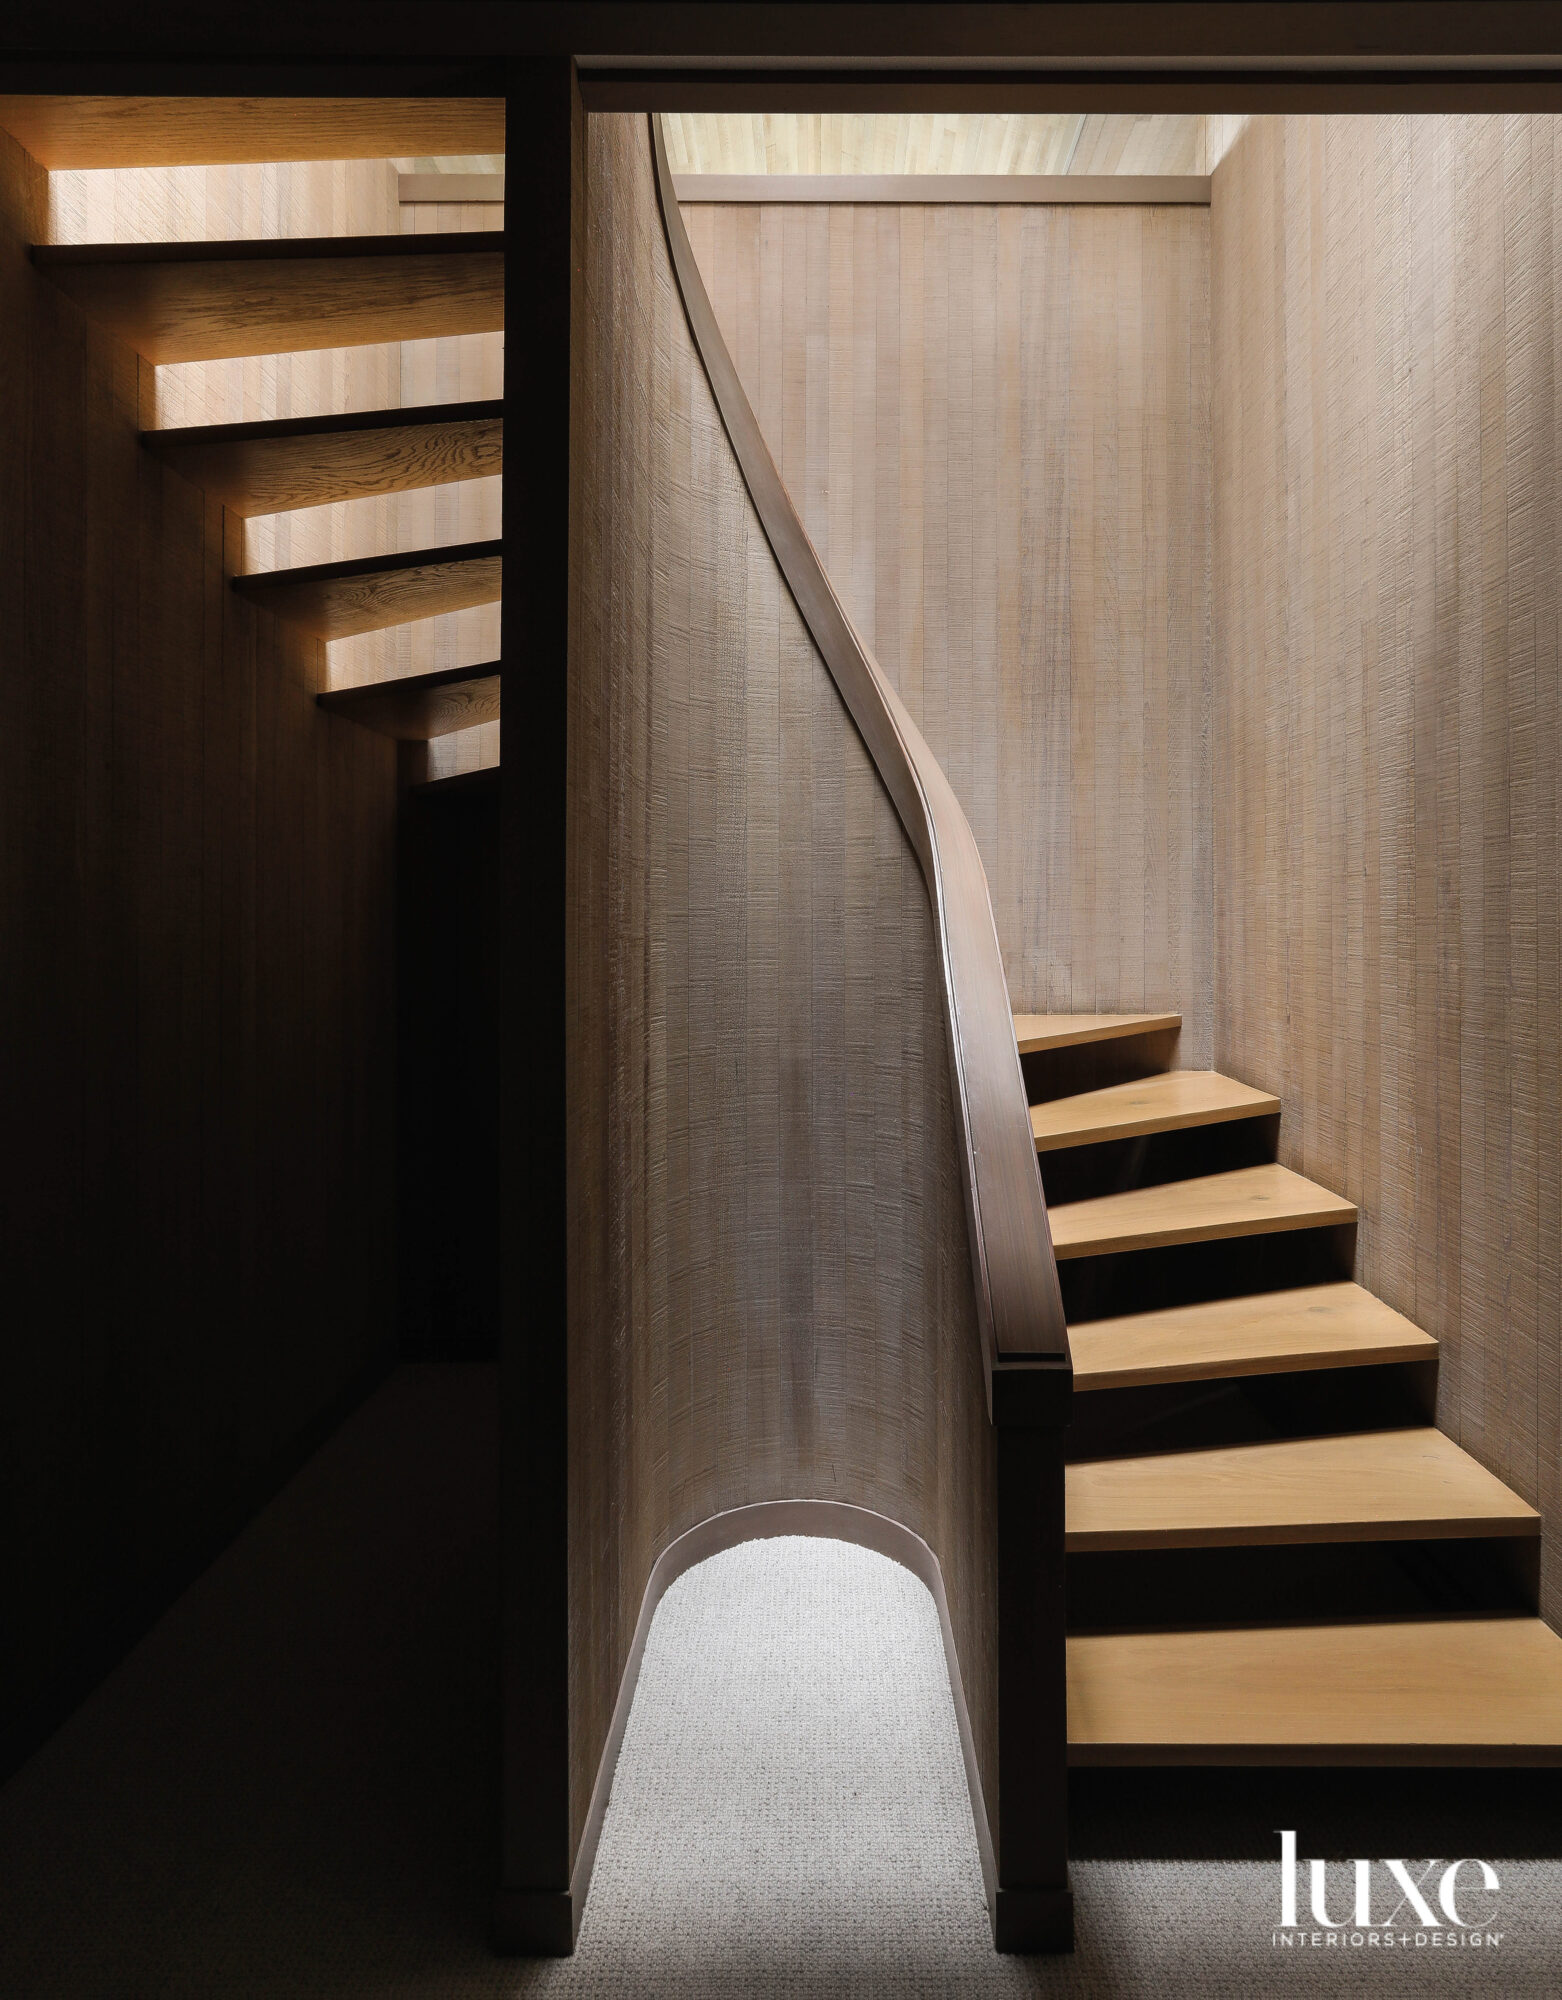 Wood paneled stairwell